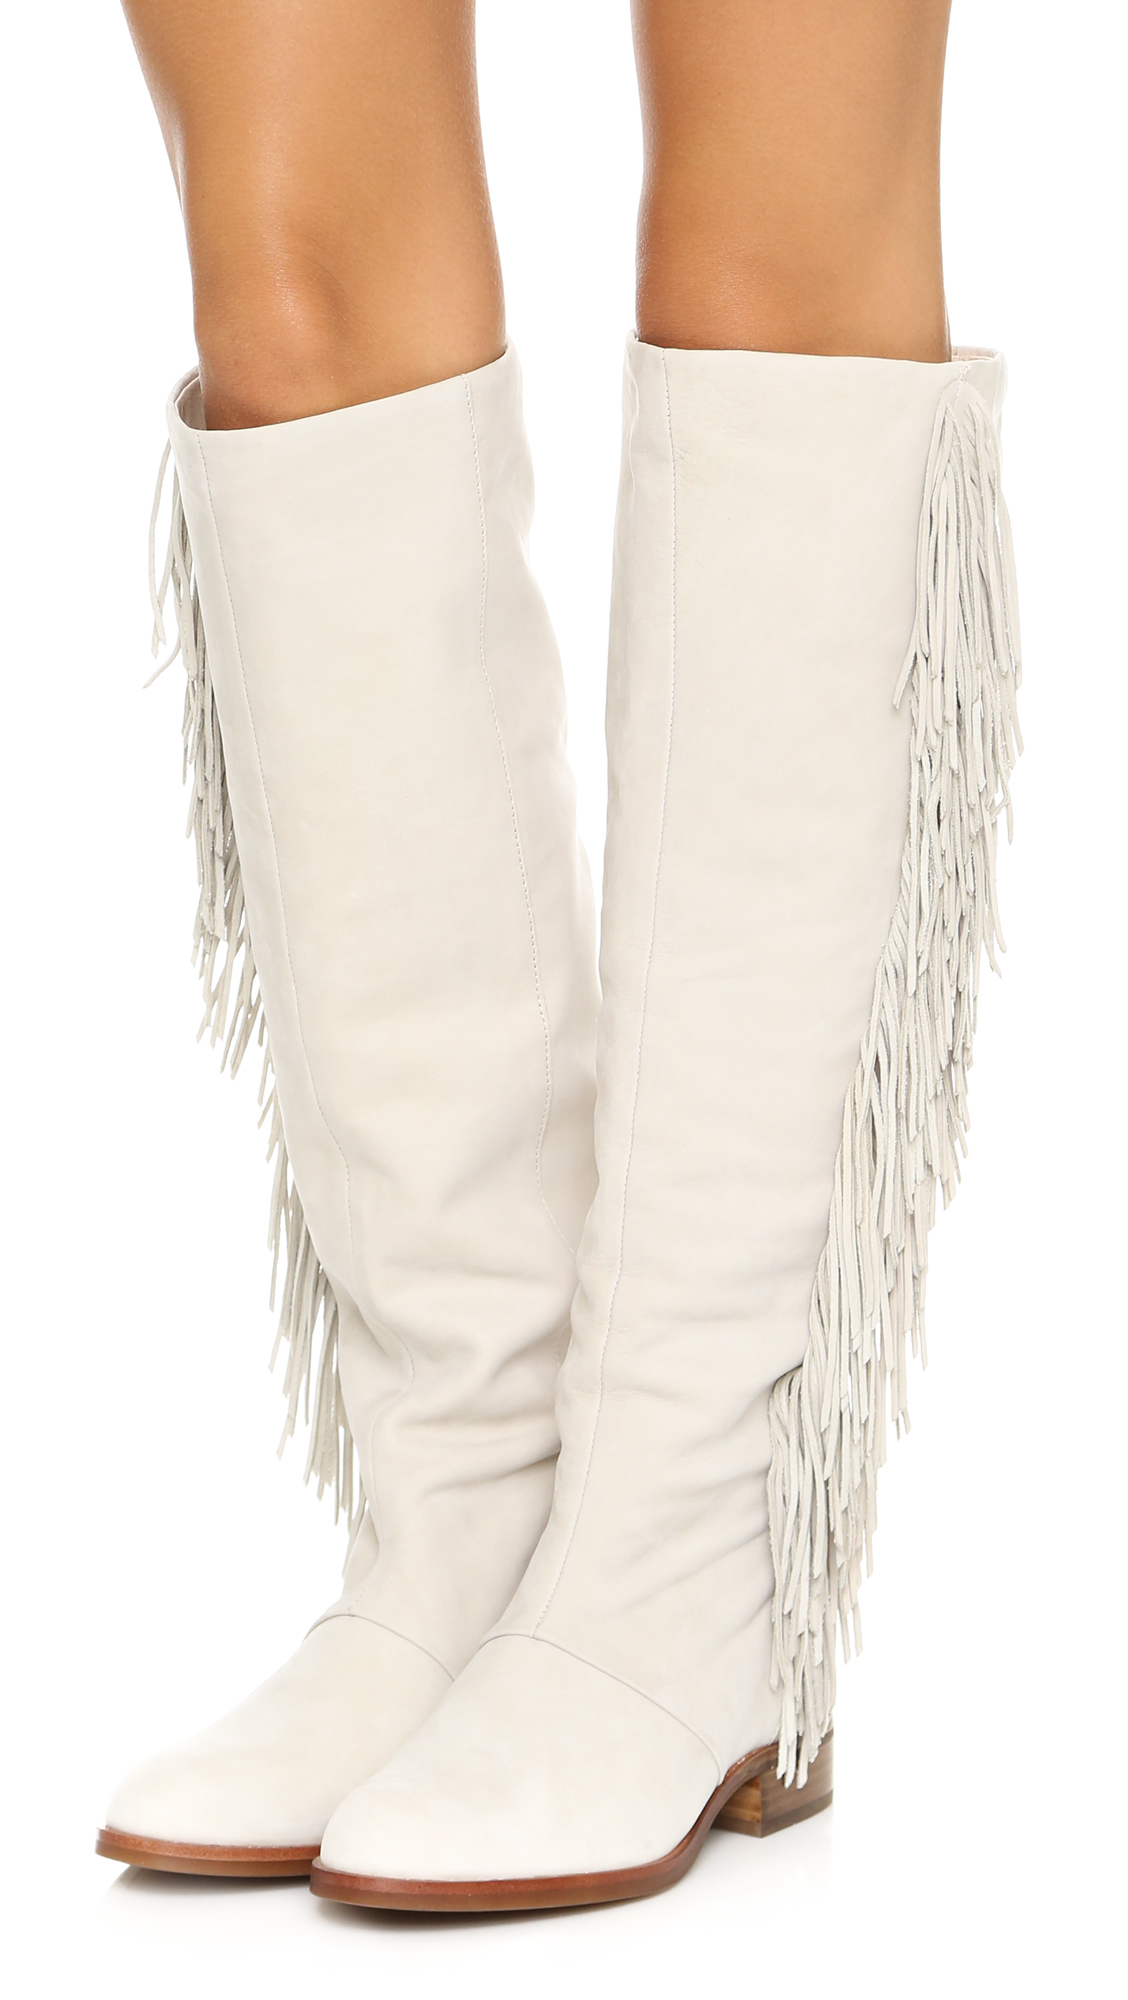 Sam Edelman Josephine Fringe Boots White In White Lyst